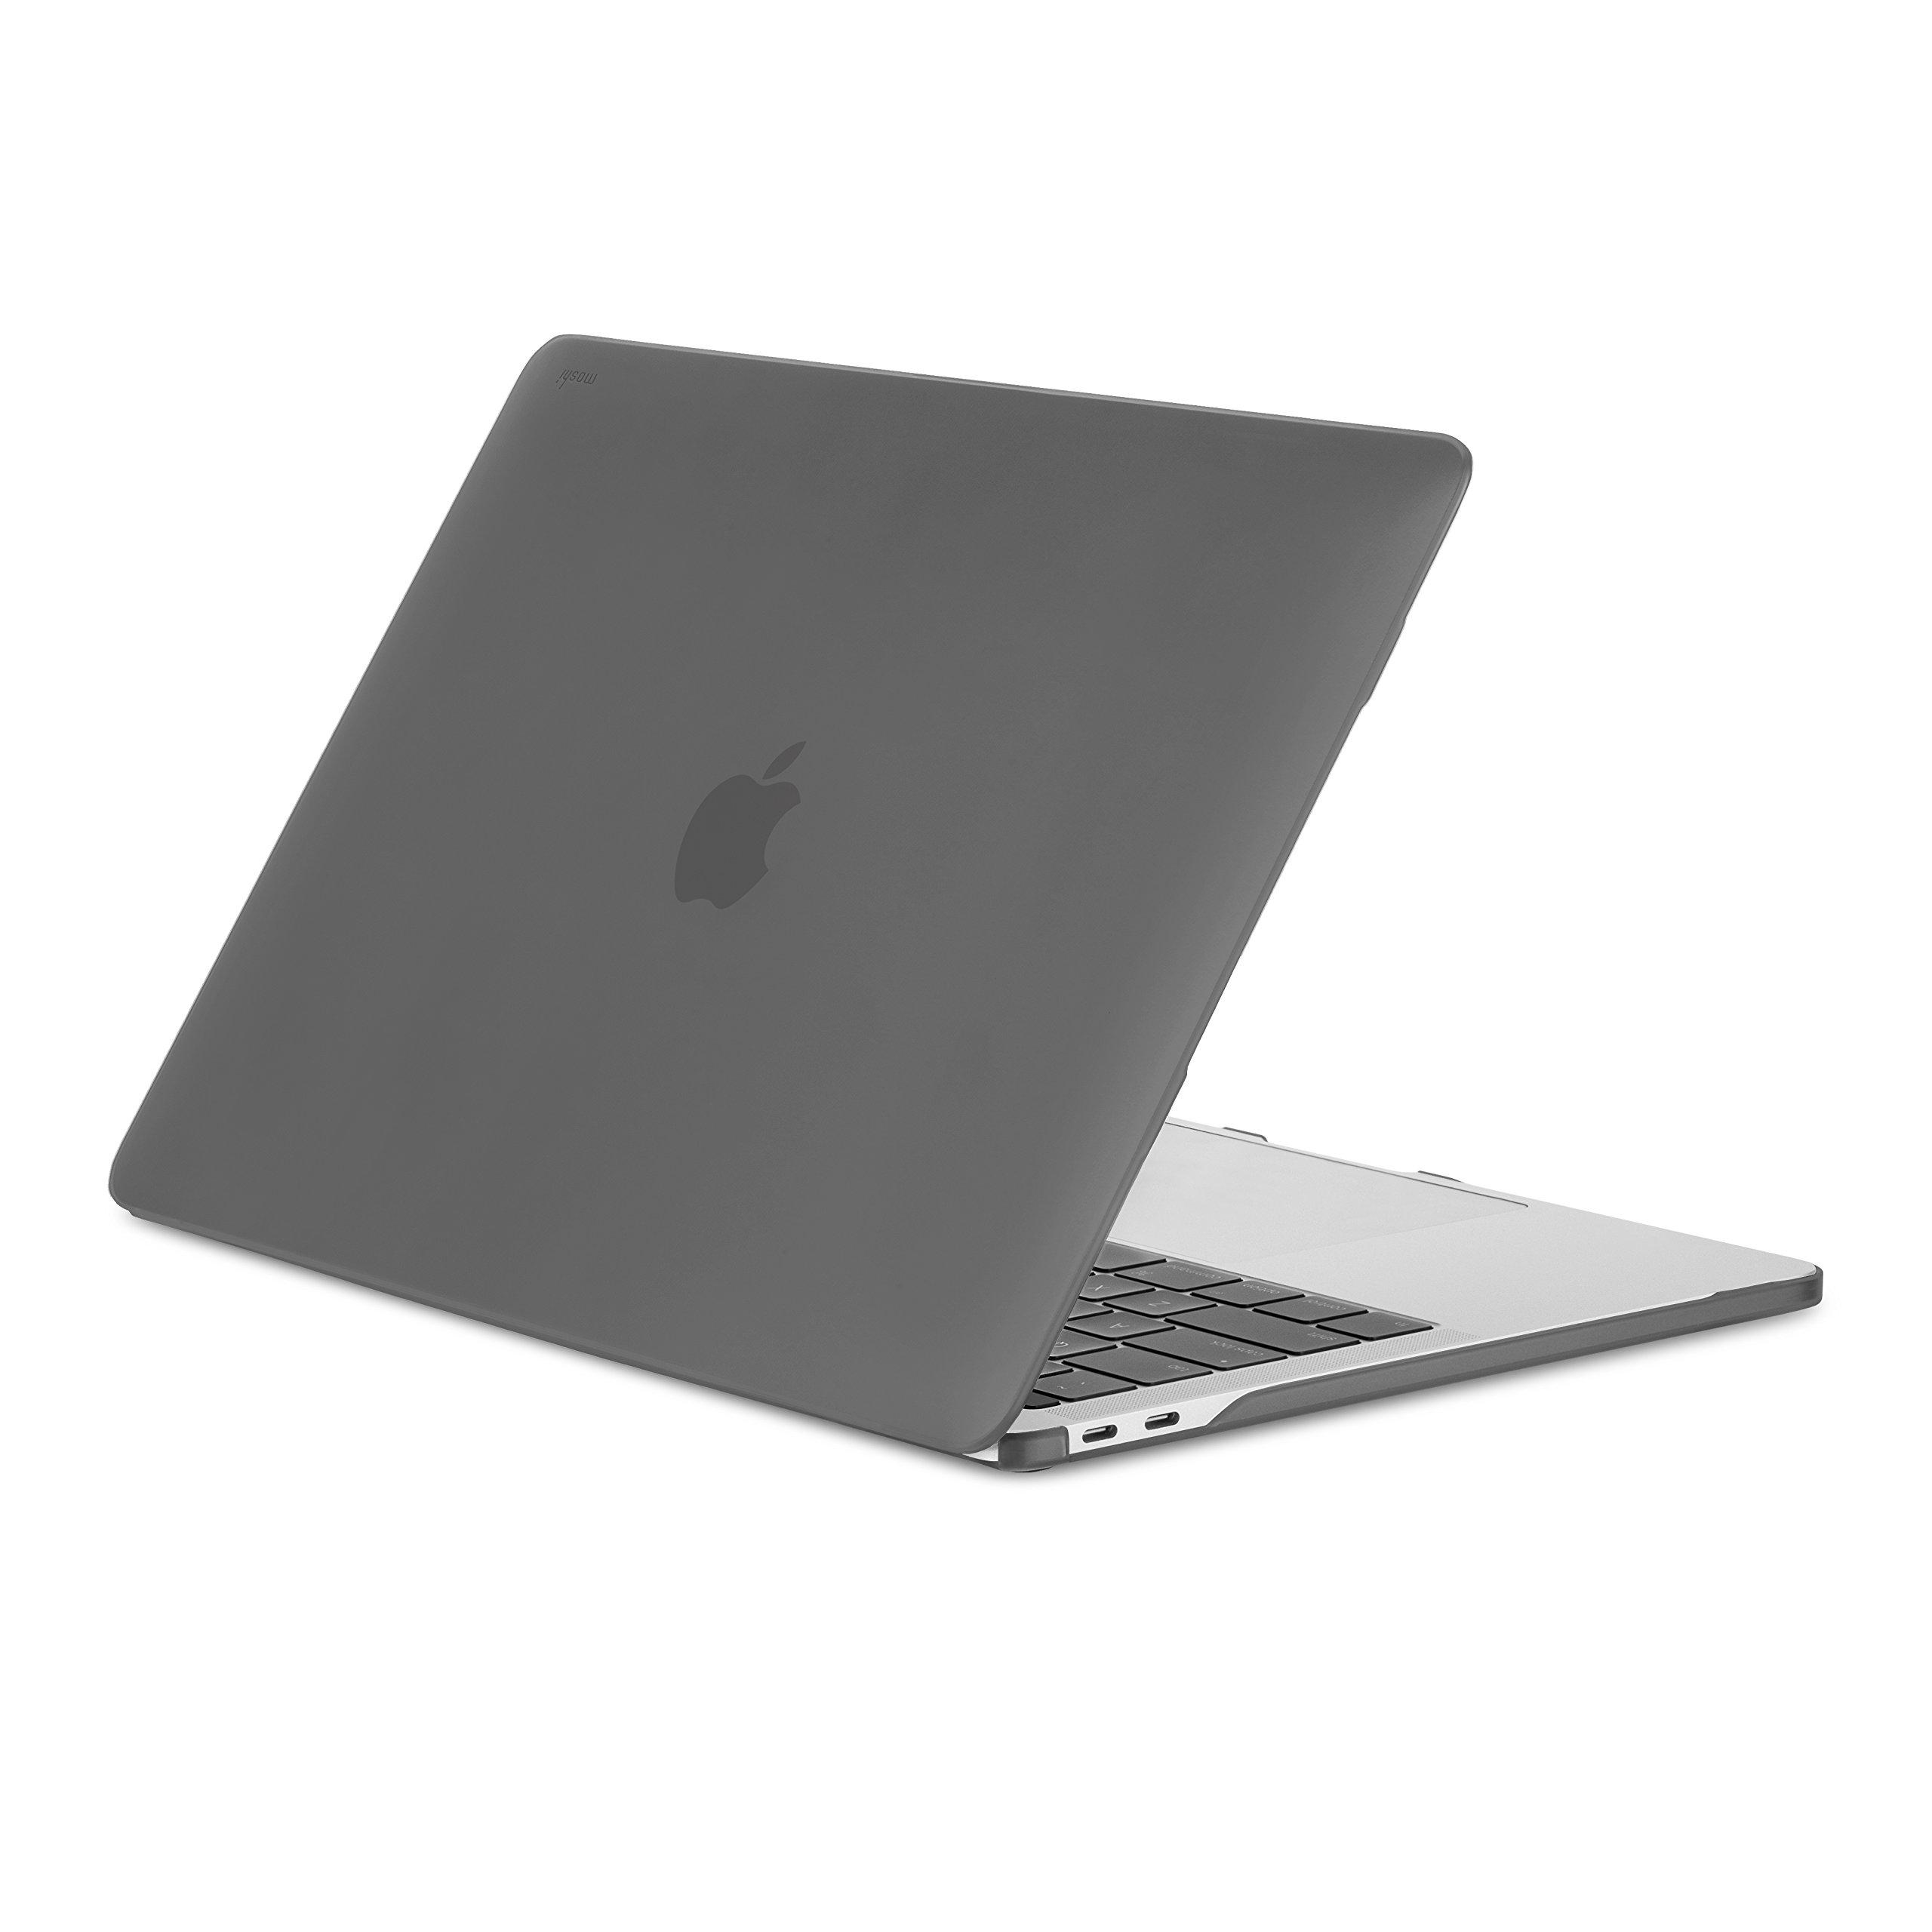 Moshi iGlaze Hardshell Case for Macbook Pro 2016 13'' w/ Touch Bar - Black by Moshi